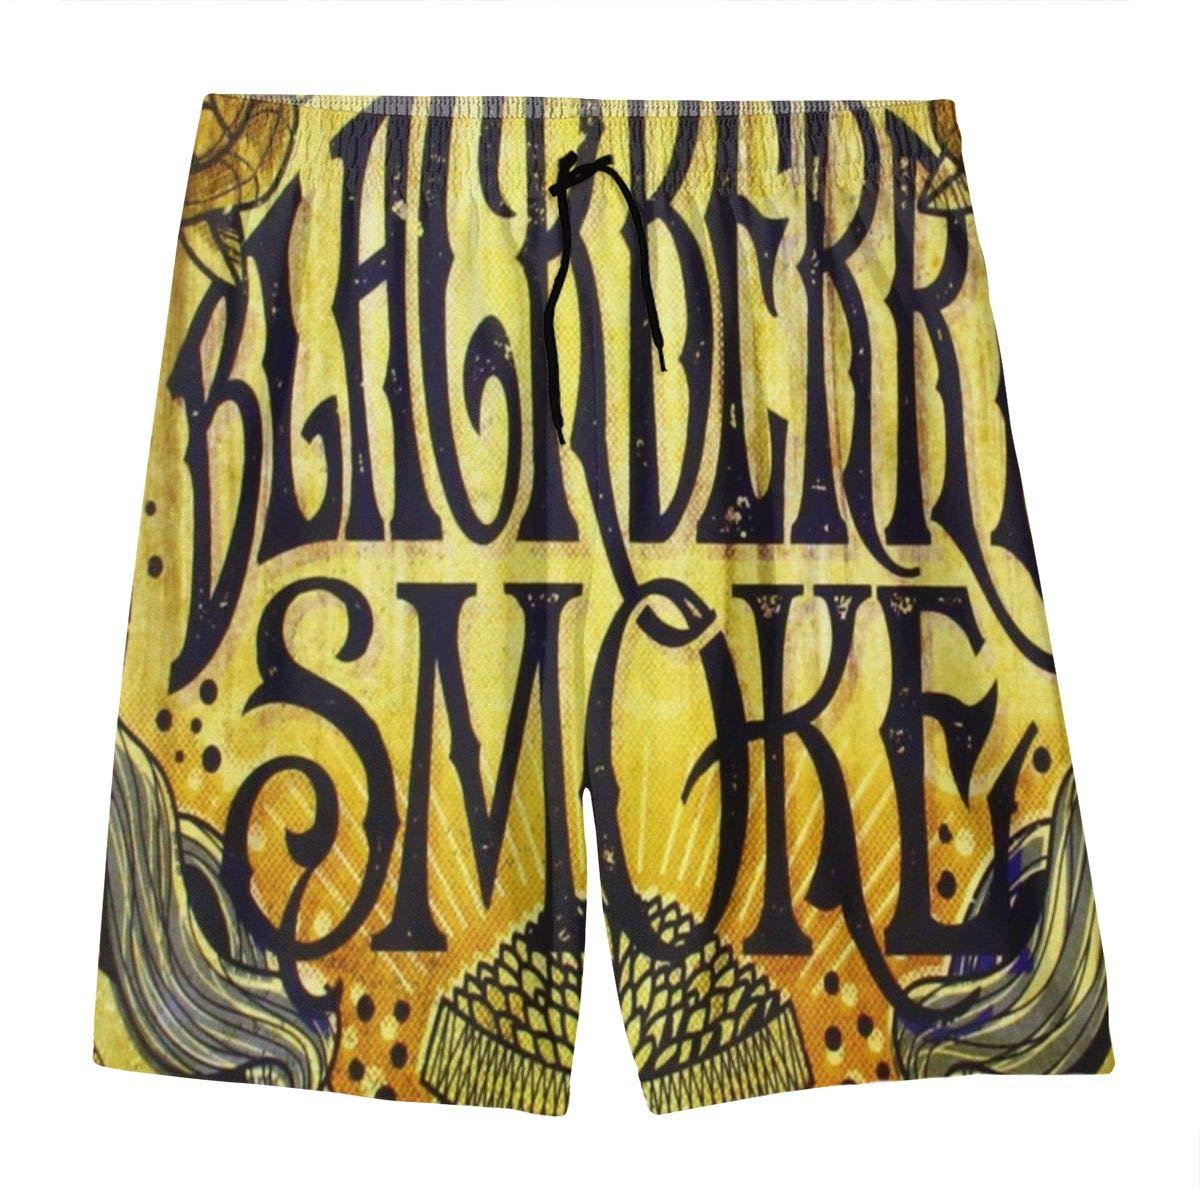 ElizabethLFlores BlackBerry Smoke Youth Beach Pants Fashion Drawstring Board Shorts